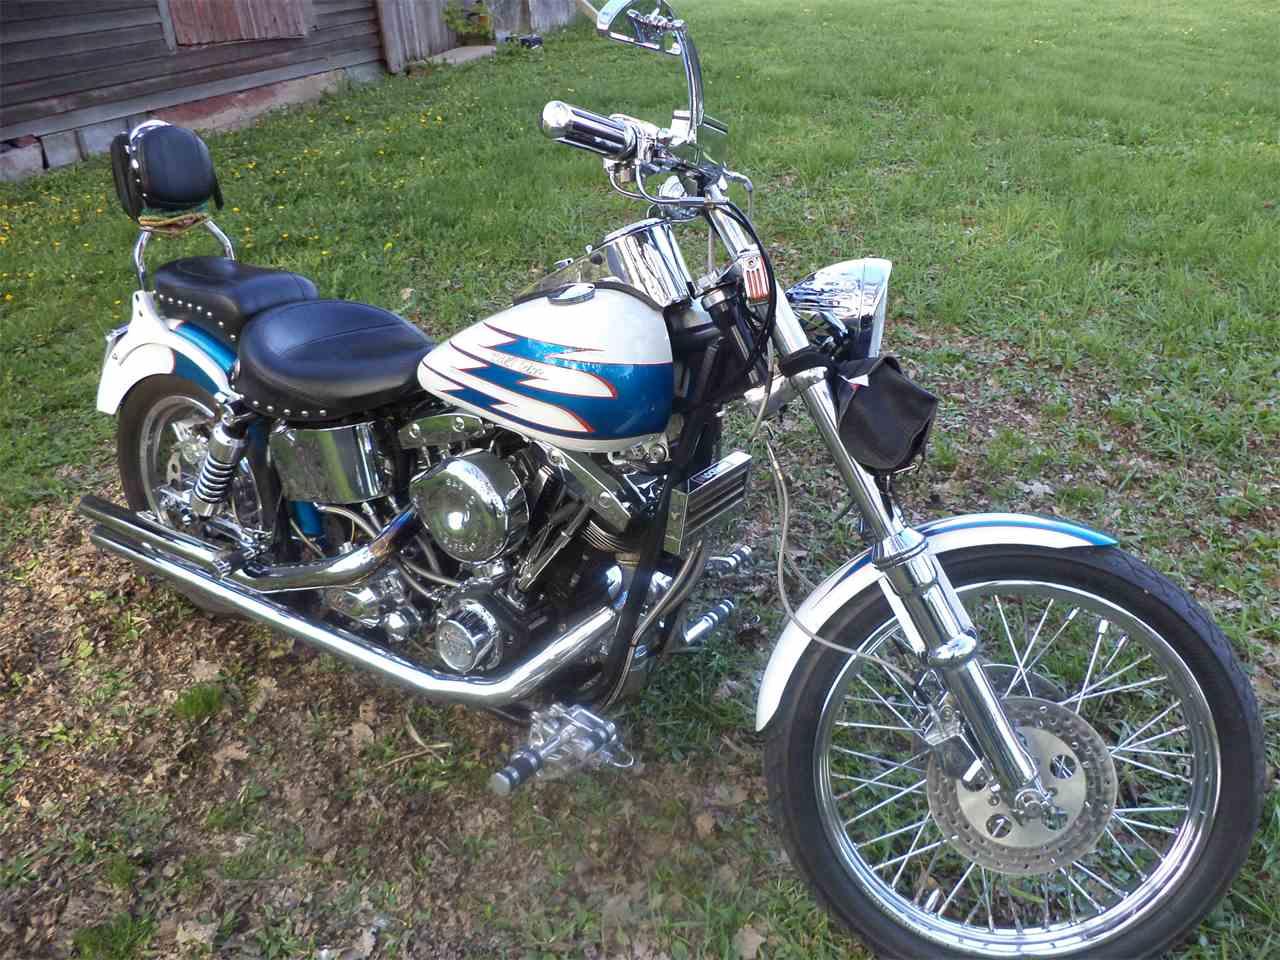 1998 Harley-Davidson Custom for Sale - CC-692111